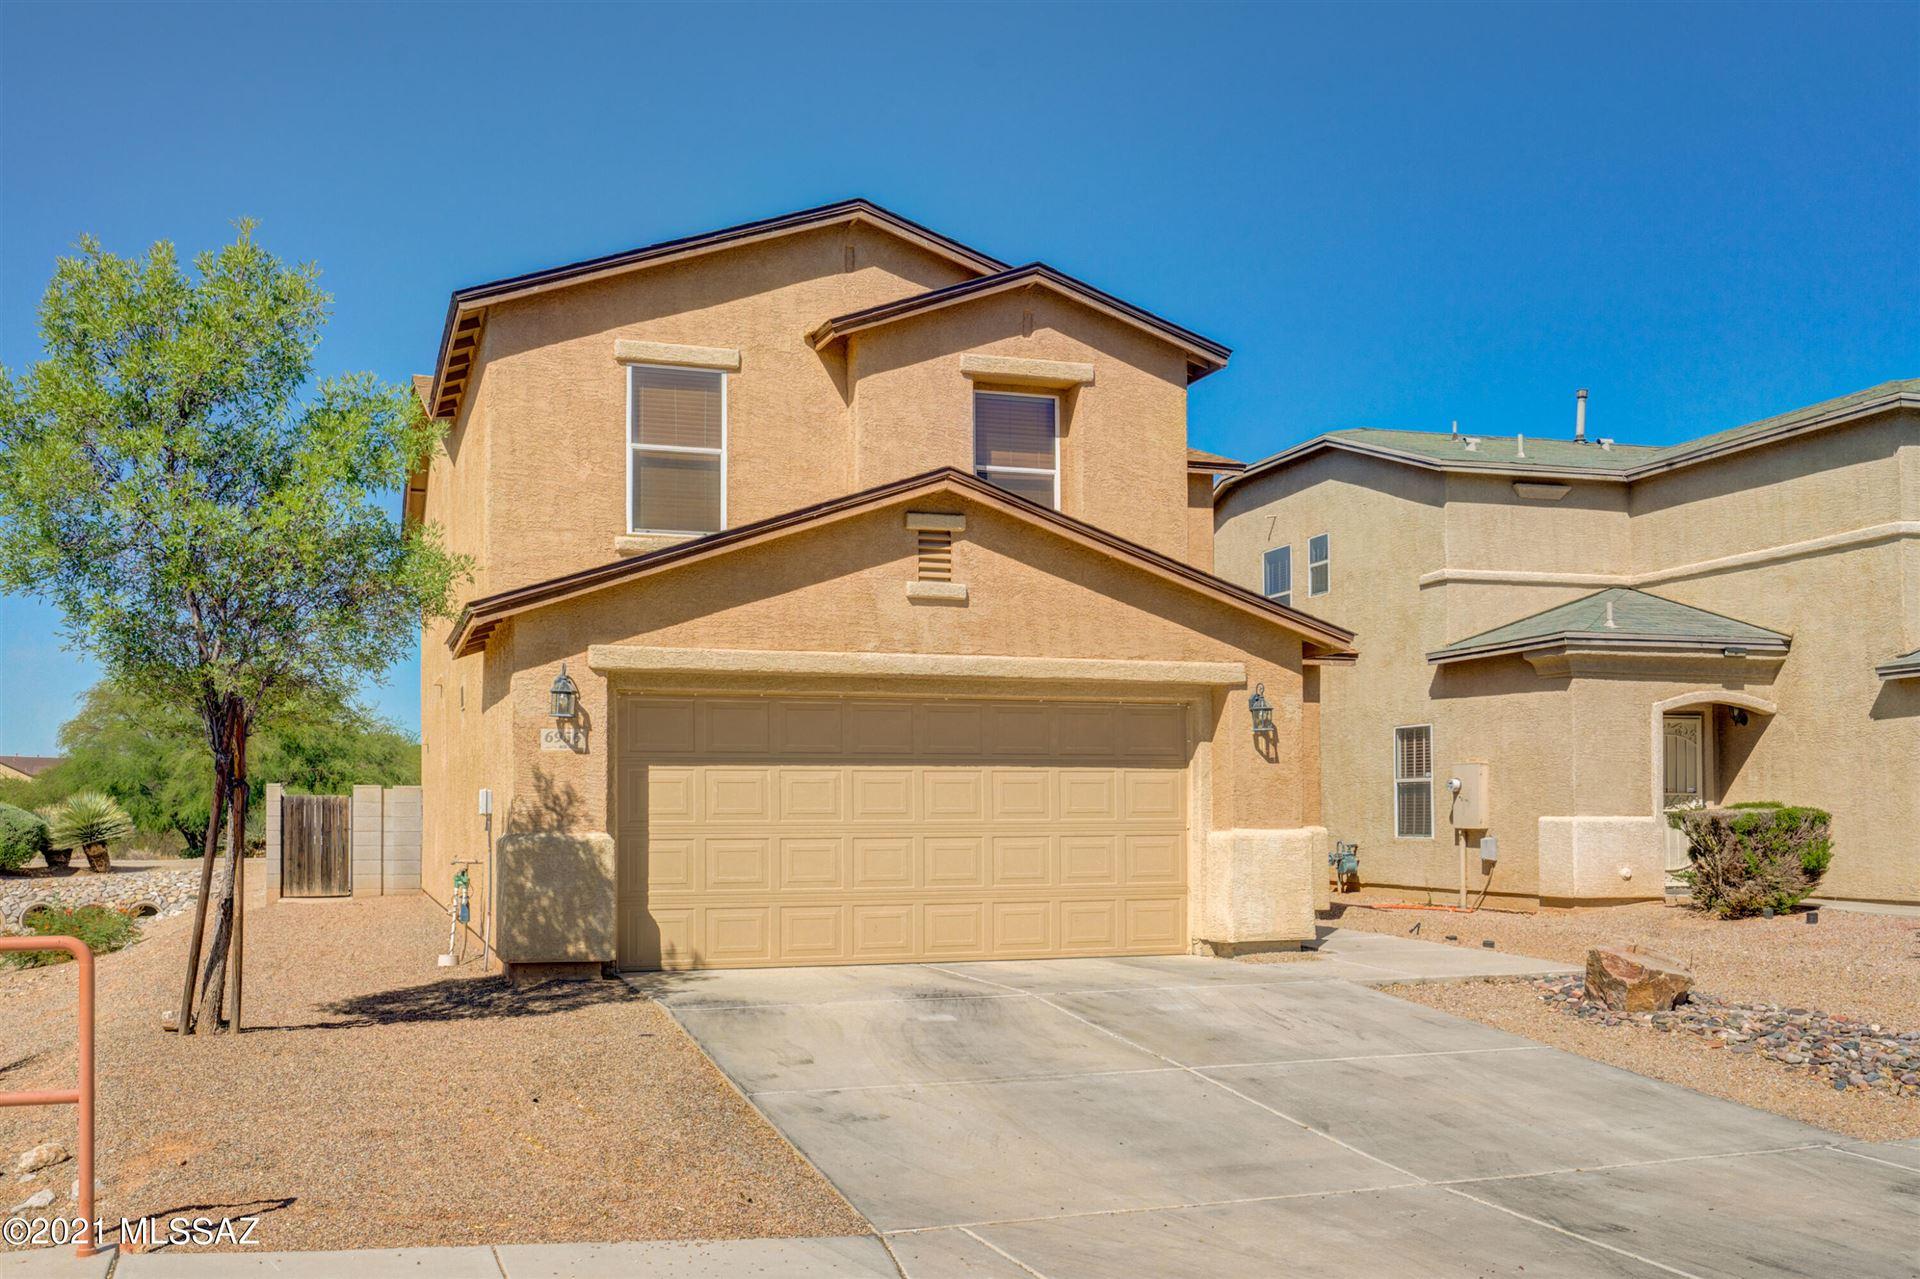 6956 S Goshawk Drive, Tucson, AZ 85756 - #: 22115363